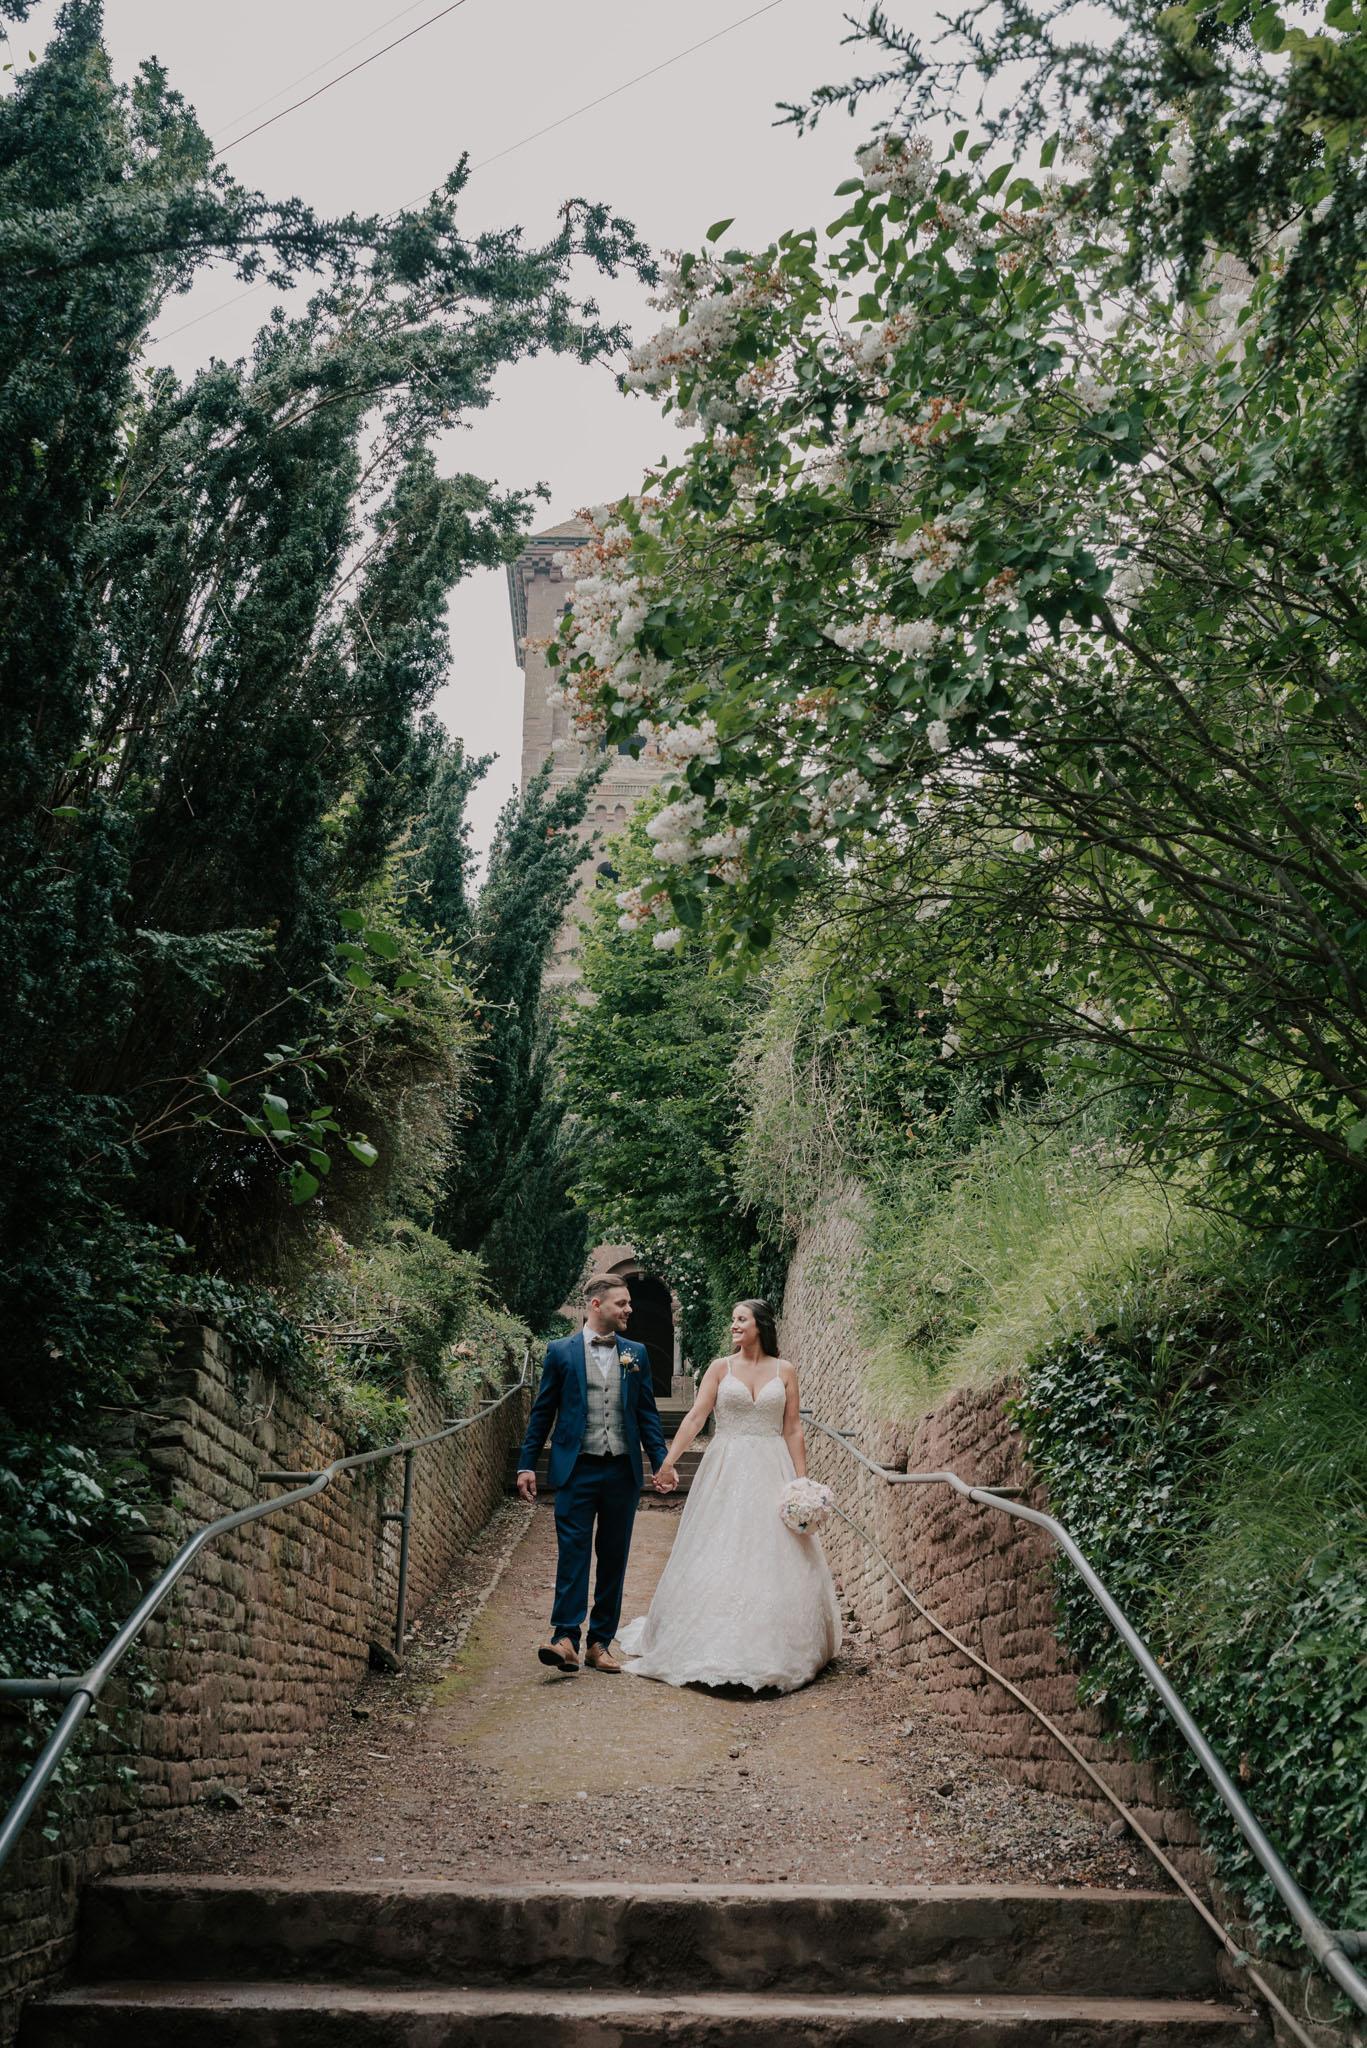 wedding-photographer-glewstone-court-hereford-scott-stockwell-photography305.jpg